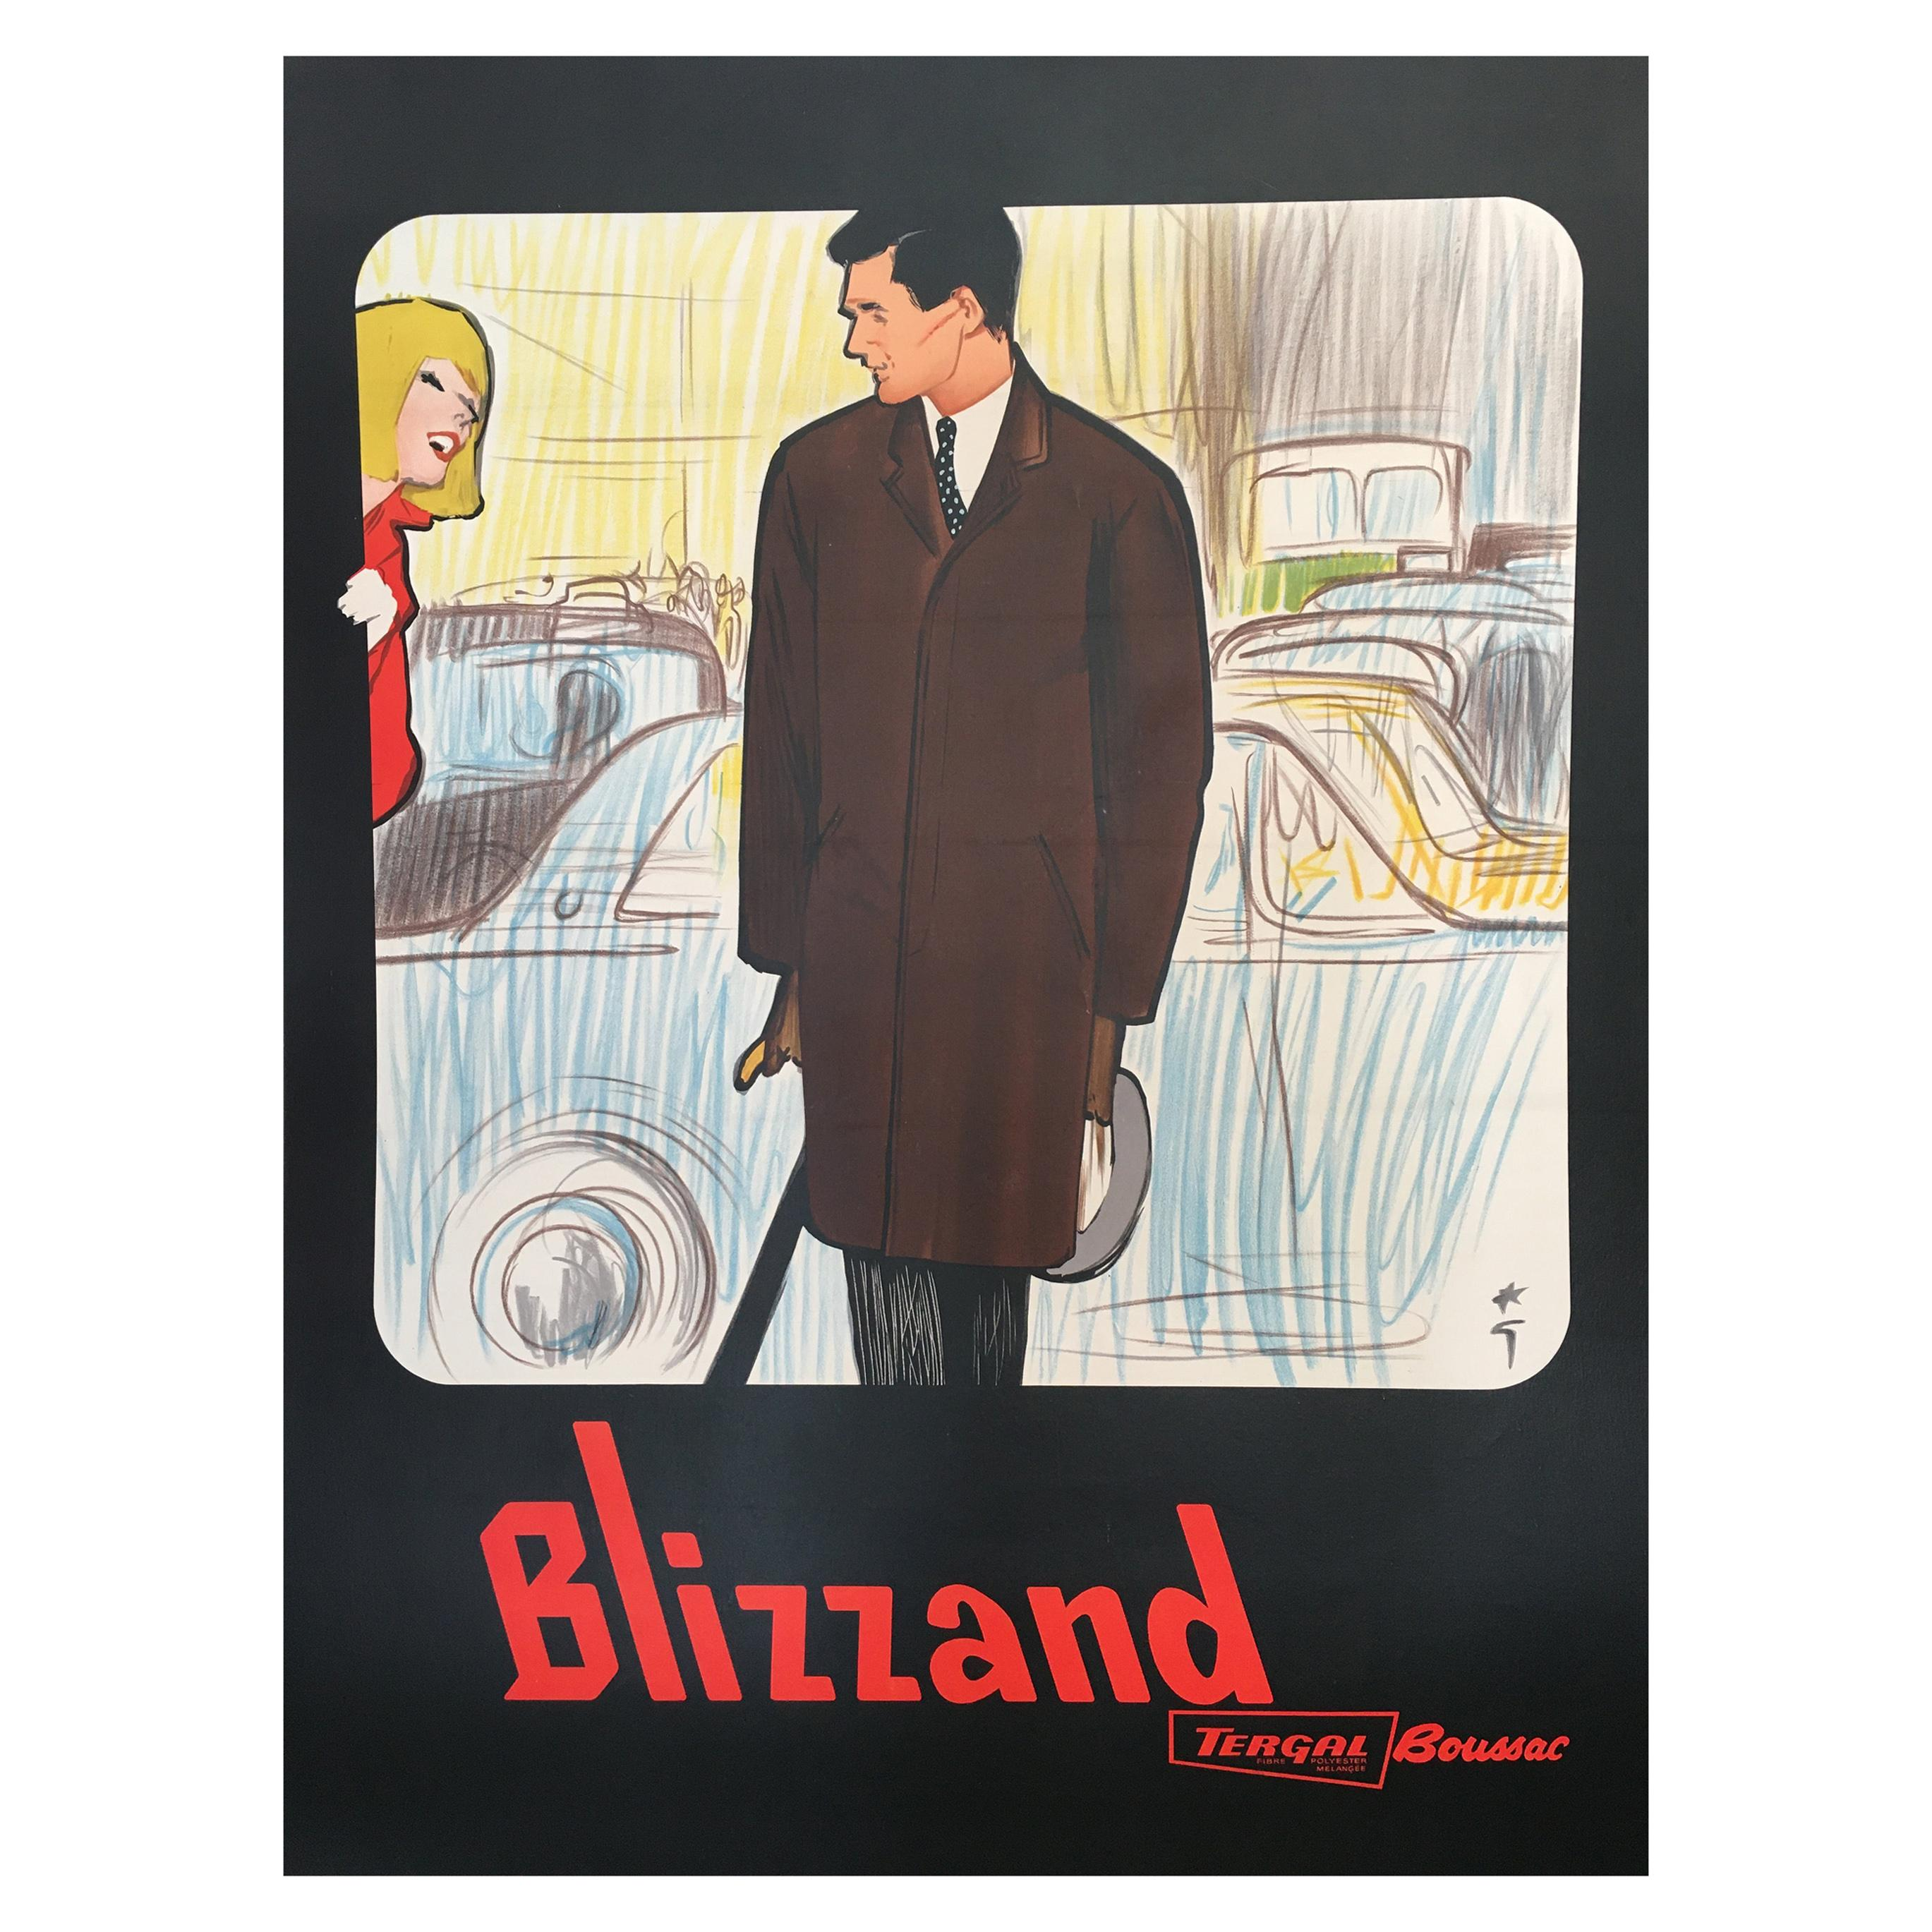 Original Vintage French Fashion Advertisement Poster 'Blizzand Man' by Gruau